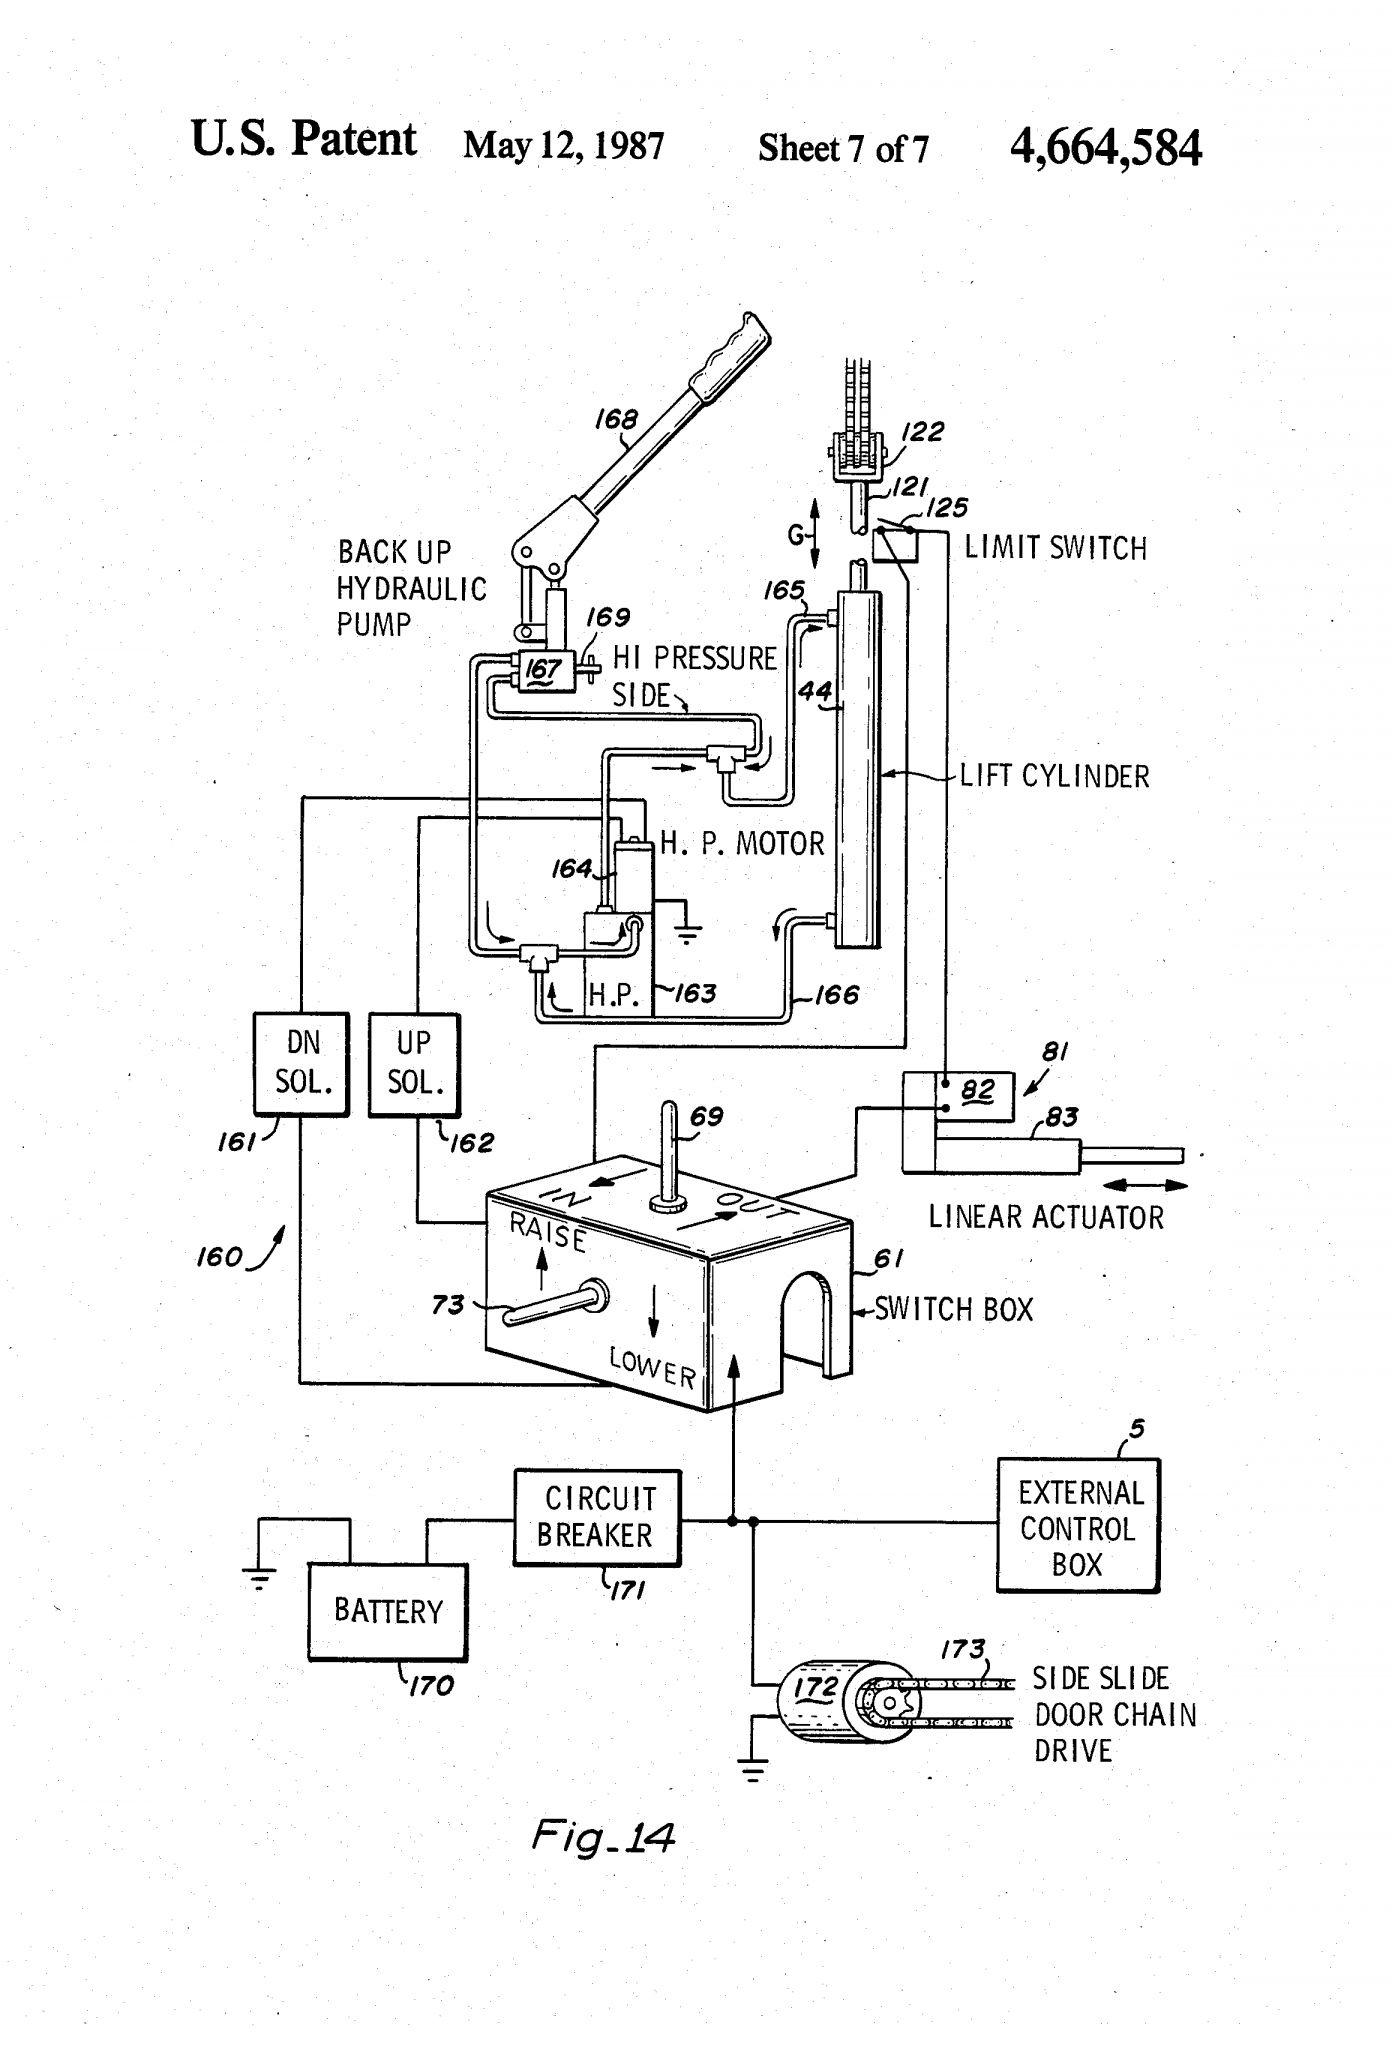 12 2 Post Car Lift Wiring Diagram